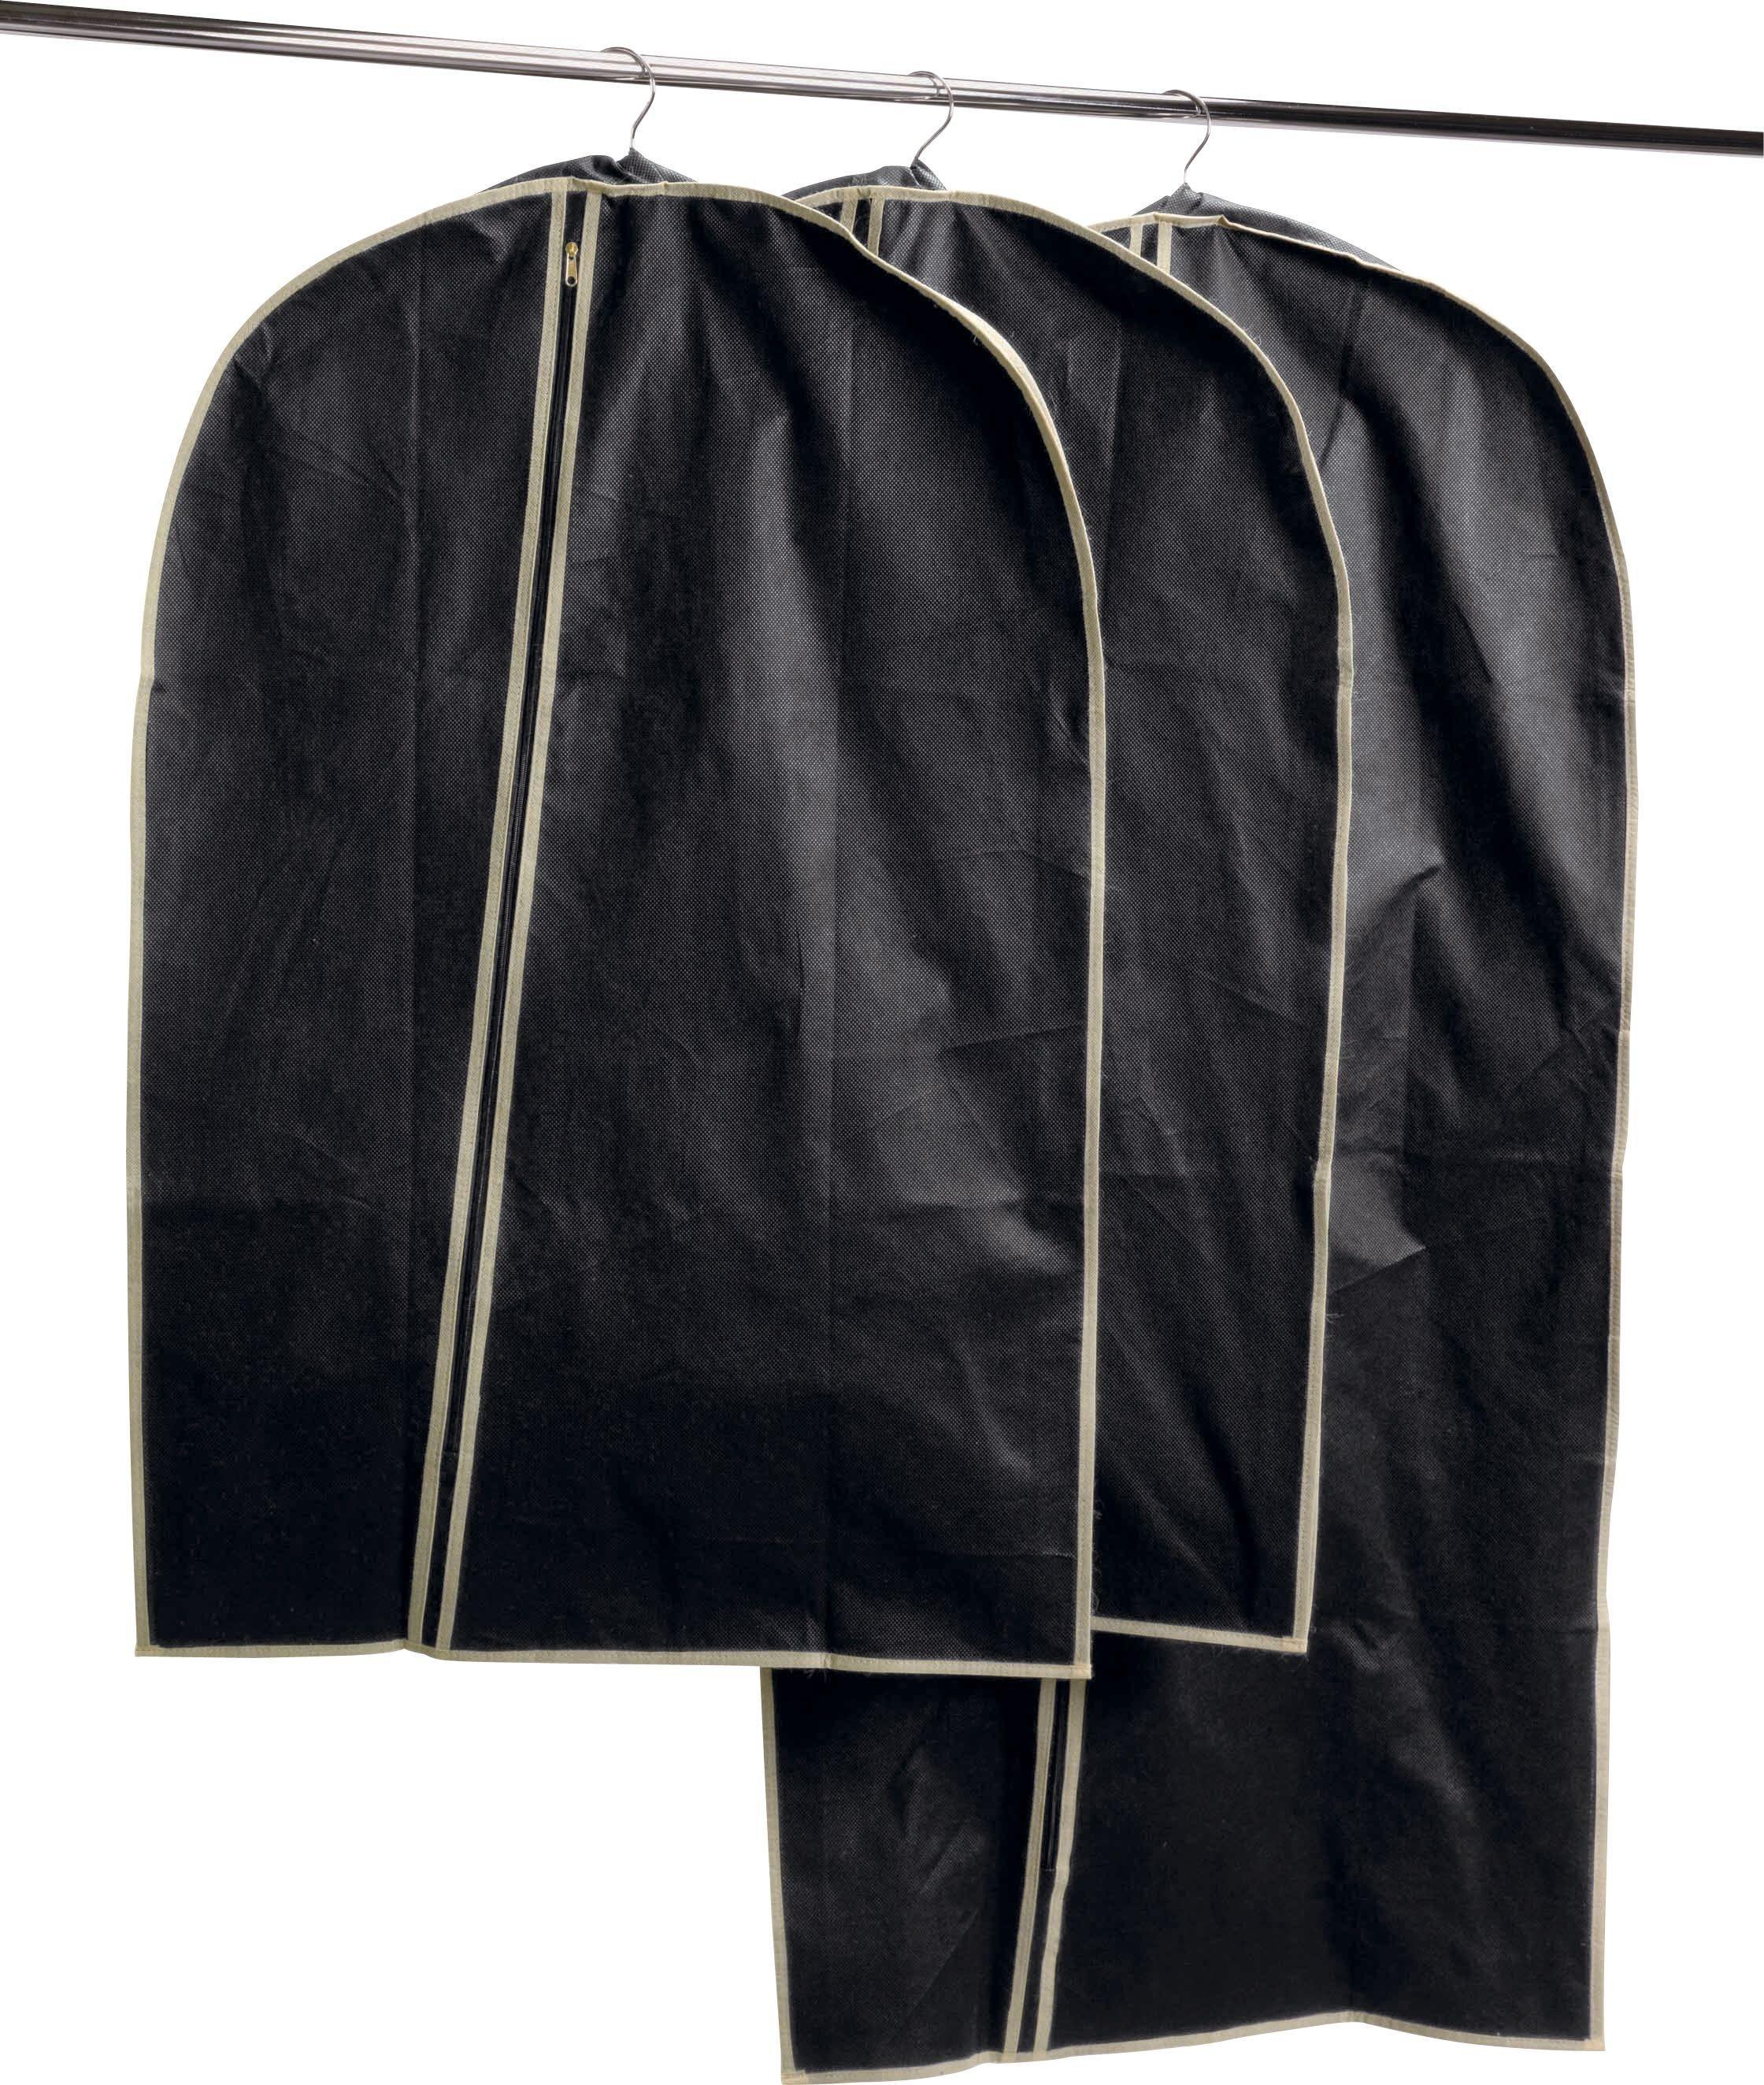 Black Set of 3 Suit Carriers